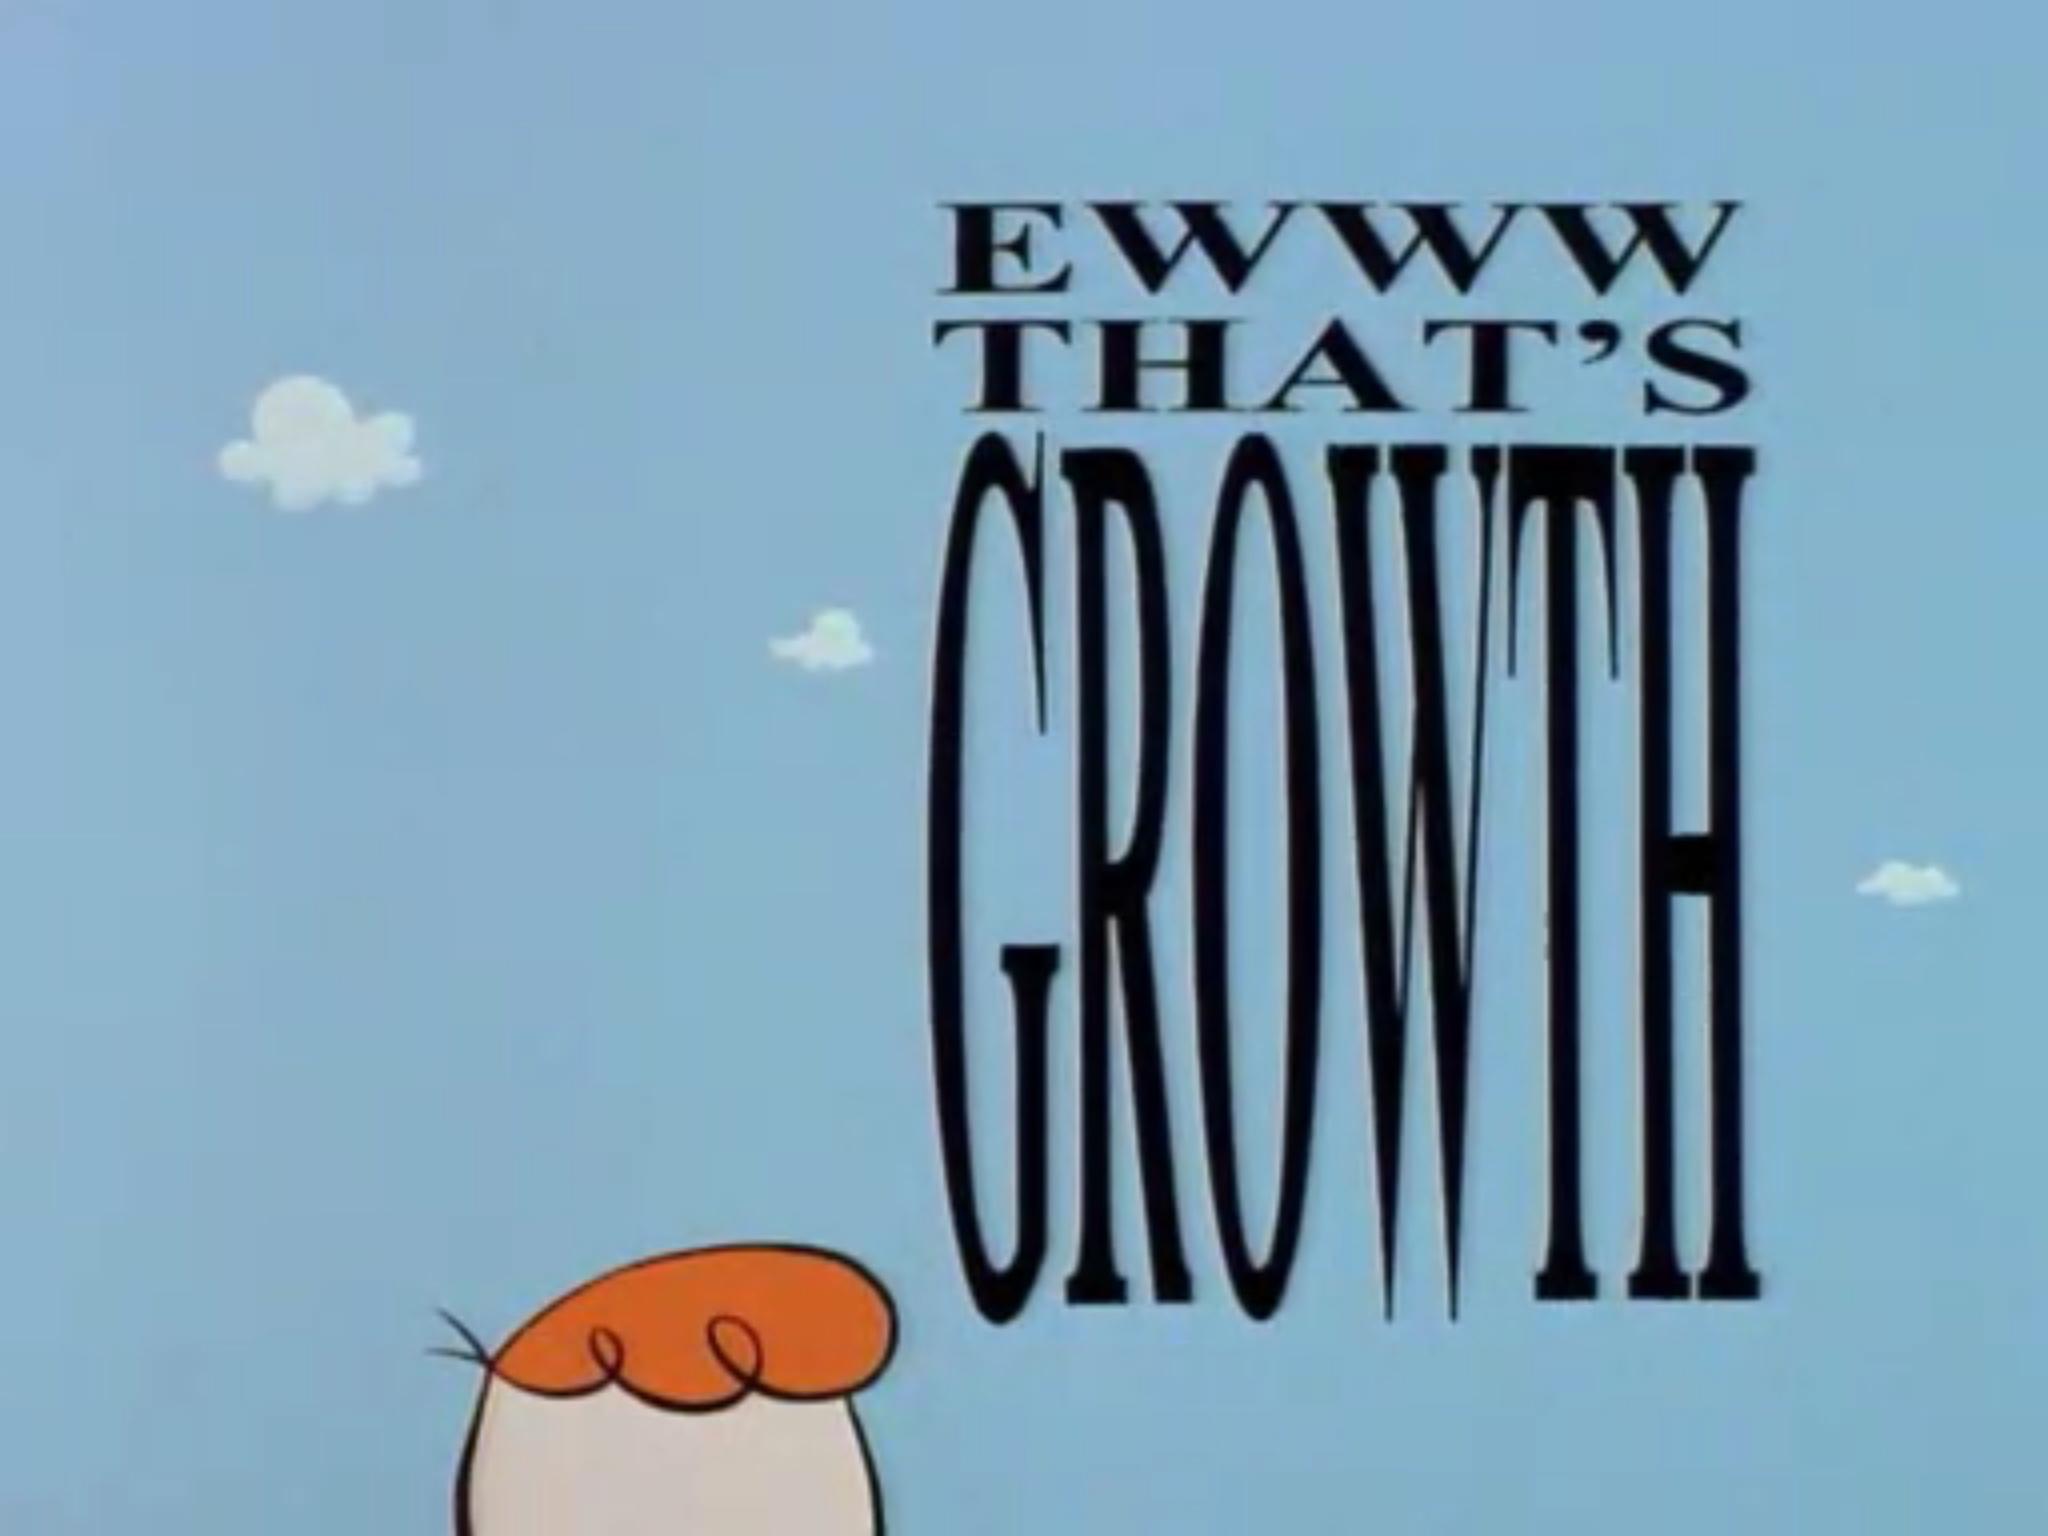 File:Ewwthatsgrowth.jpg